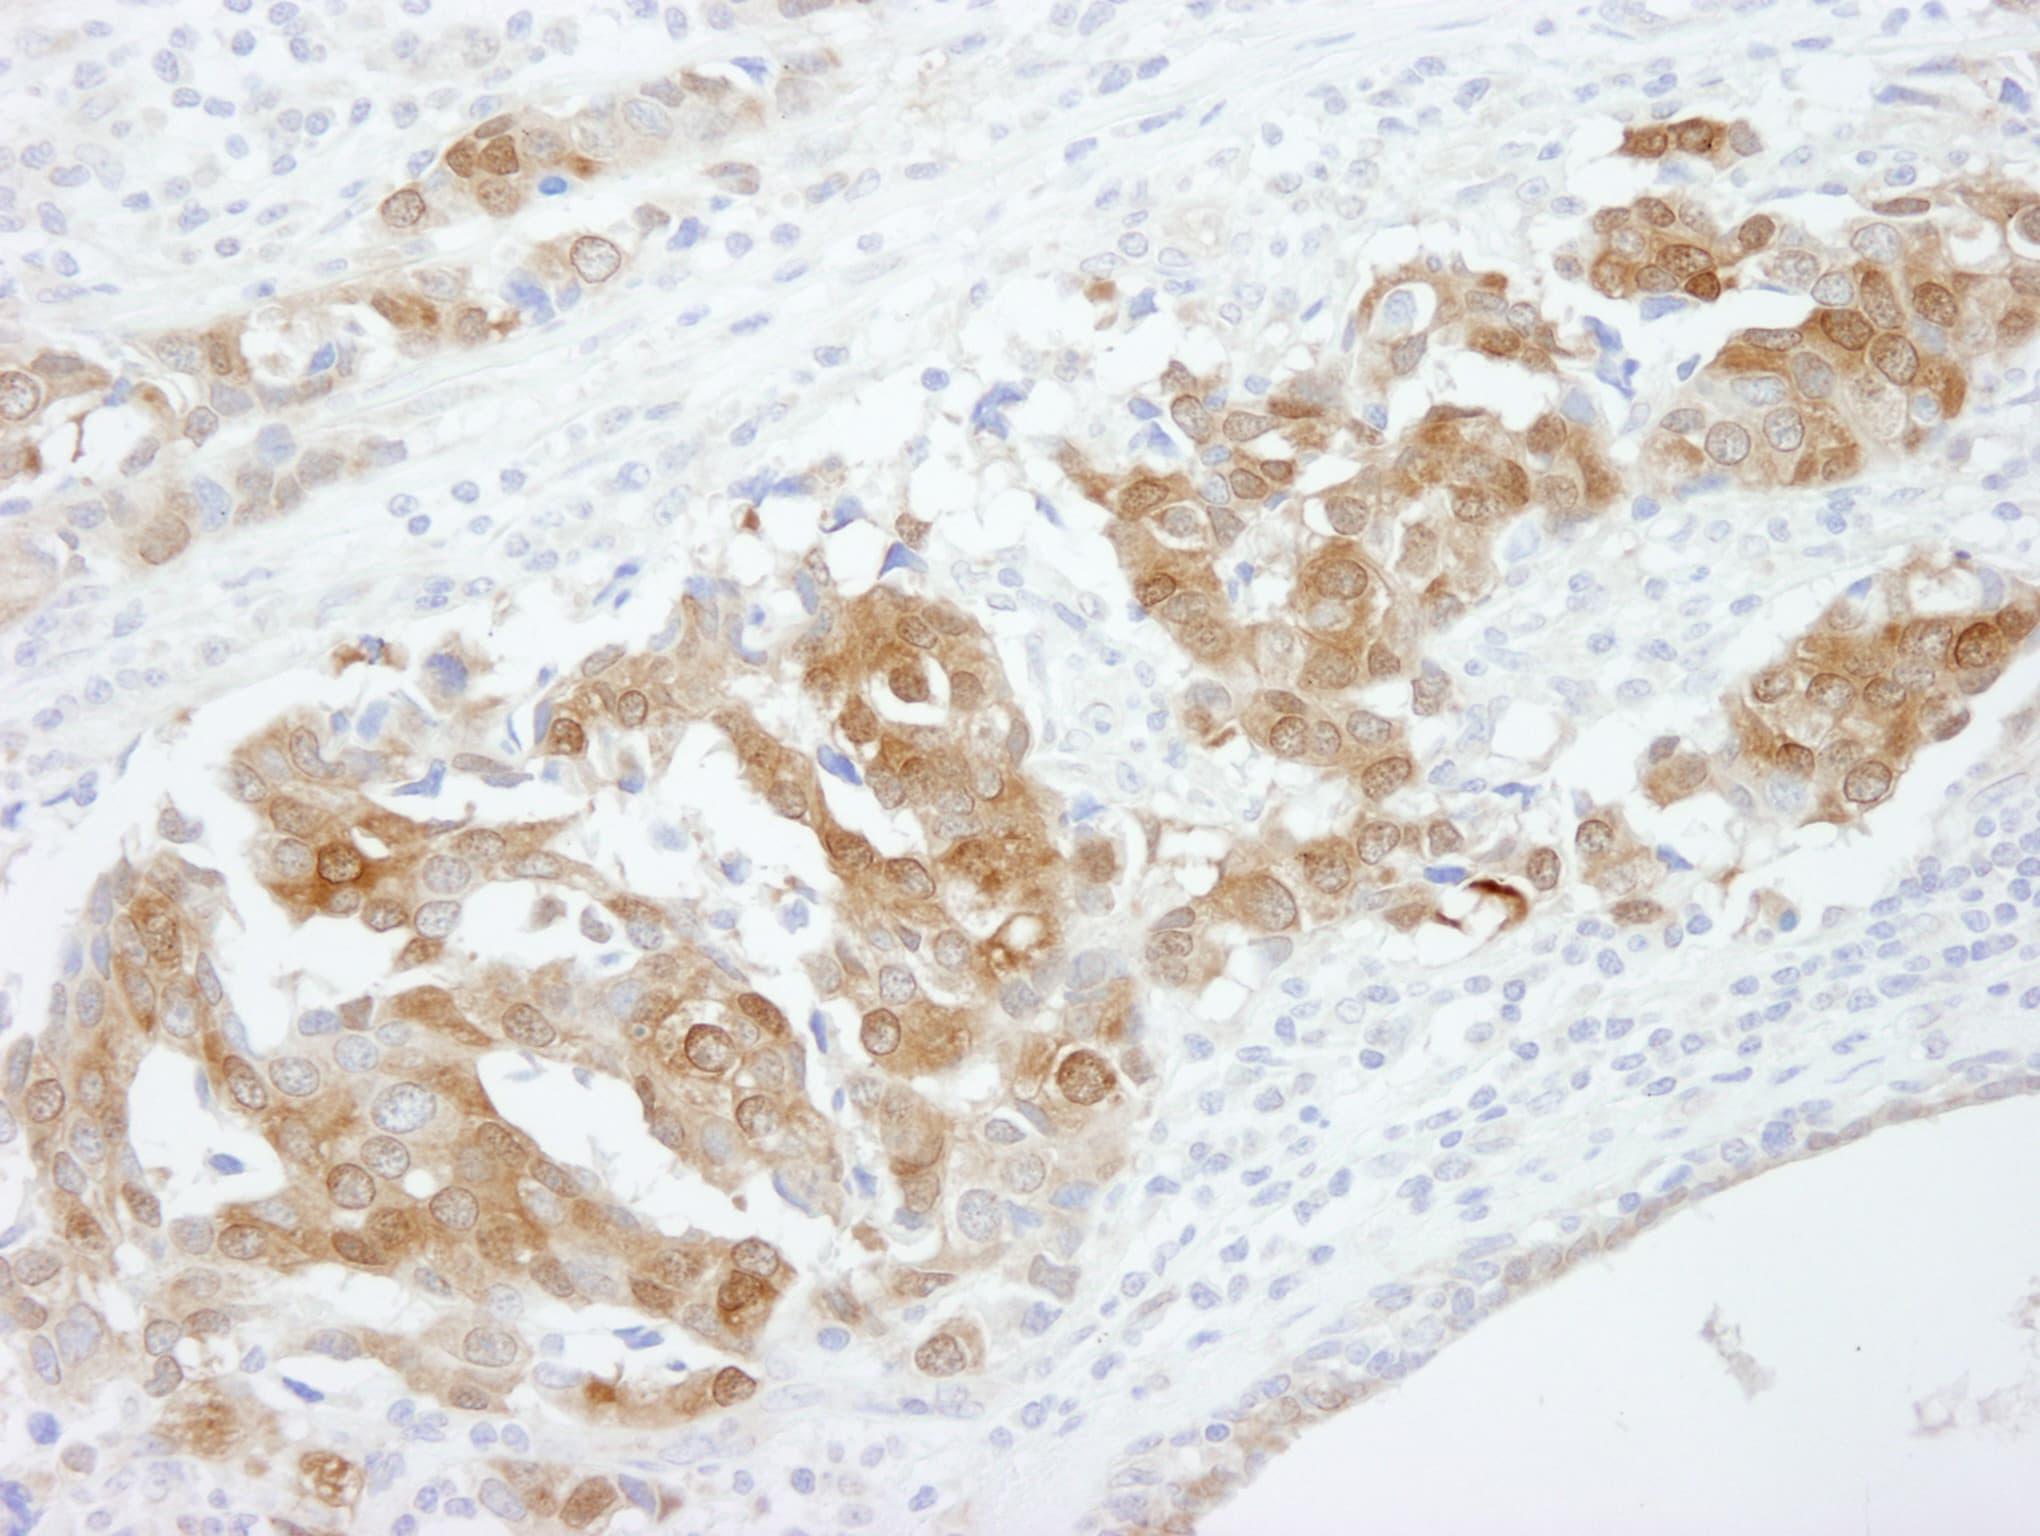 CRABP2 Antibody in Immunohistochemistry (IHC)